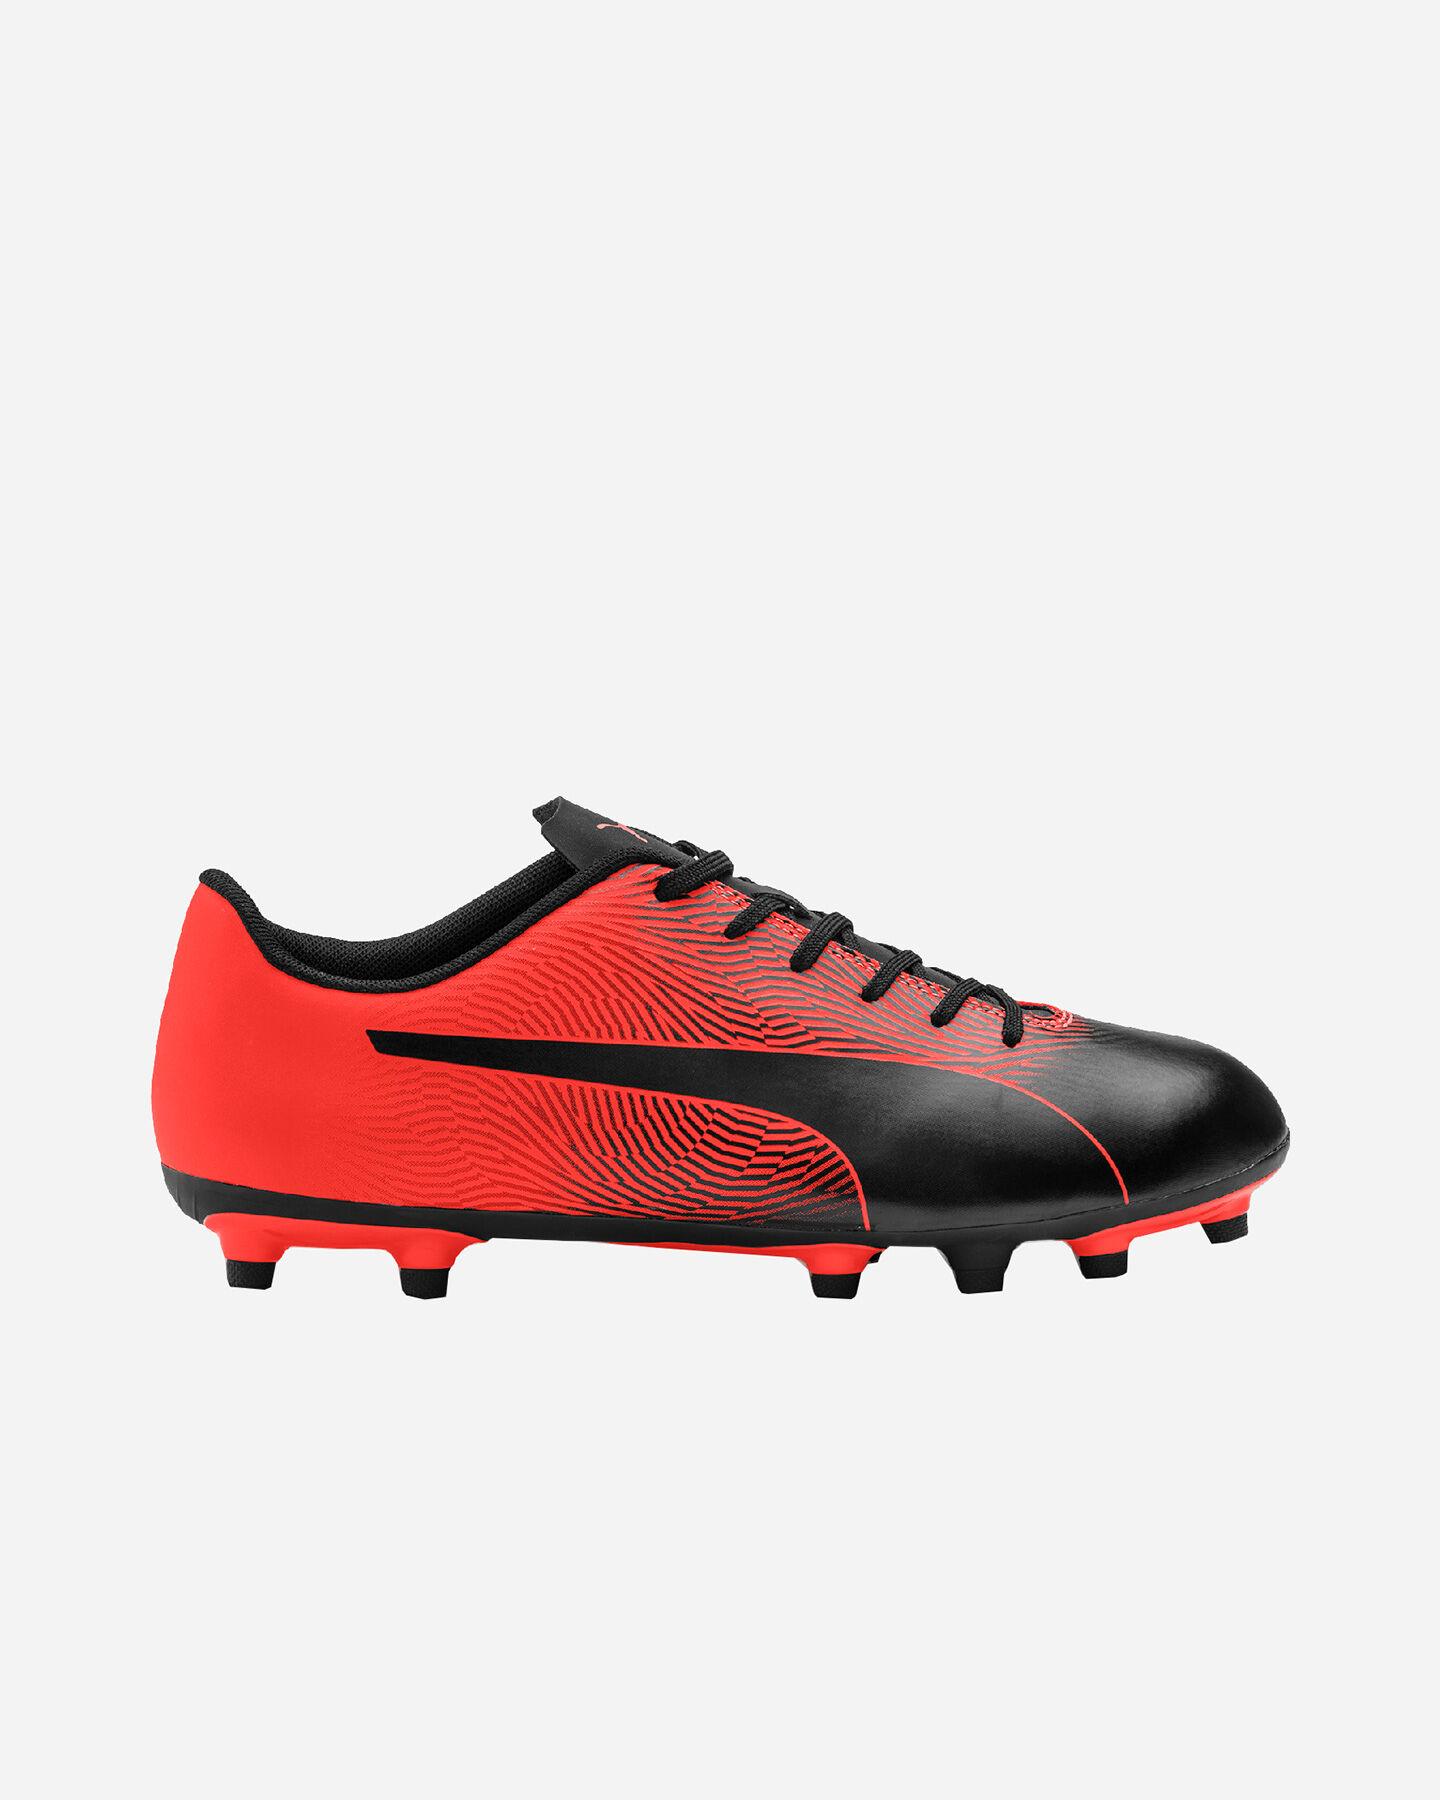 scarpe calcio adidas tacchetti bianchi